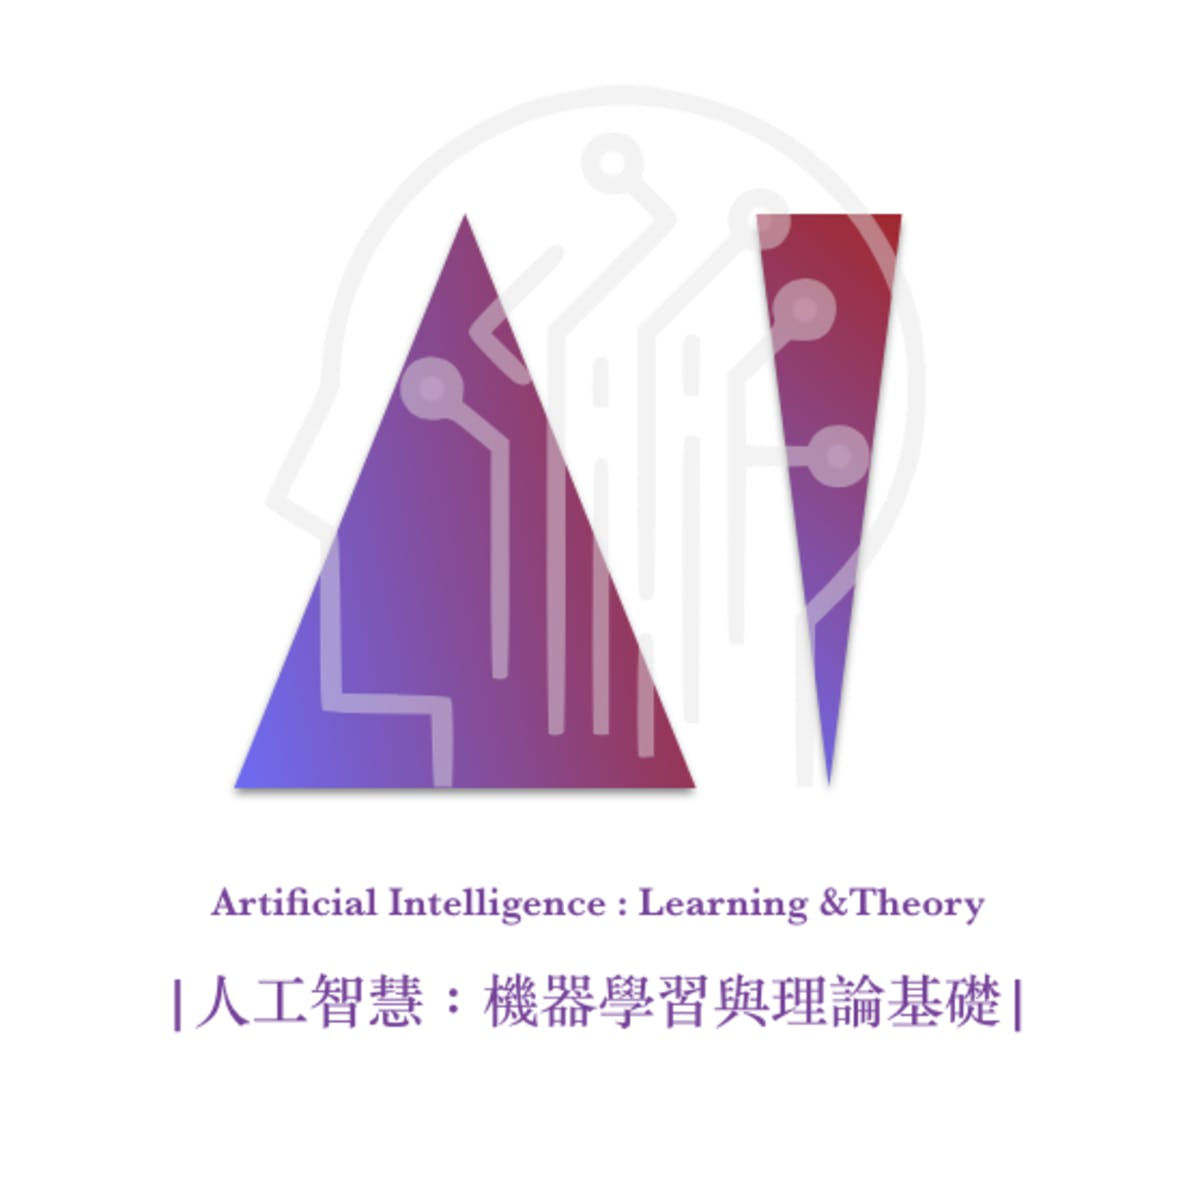 人工智慧:機器學習與理論基礎 (Artificial Intelligence - Learning & Theory)